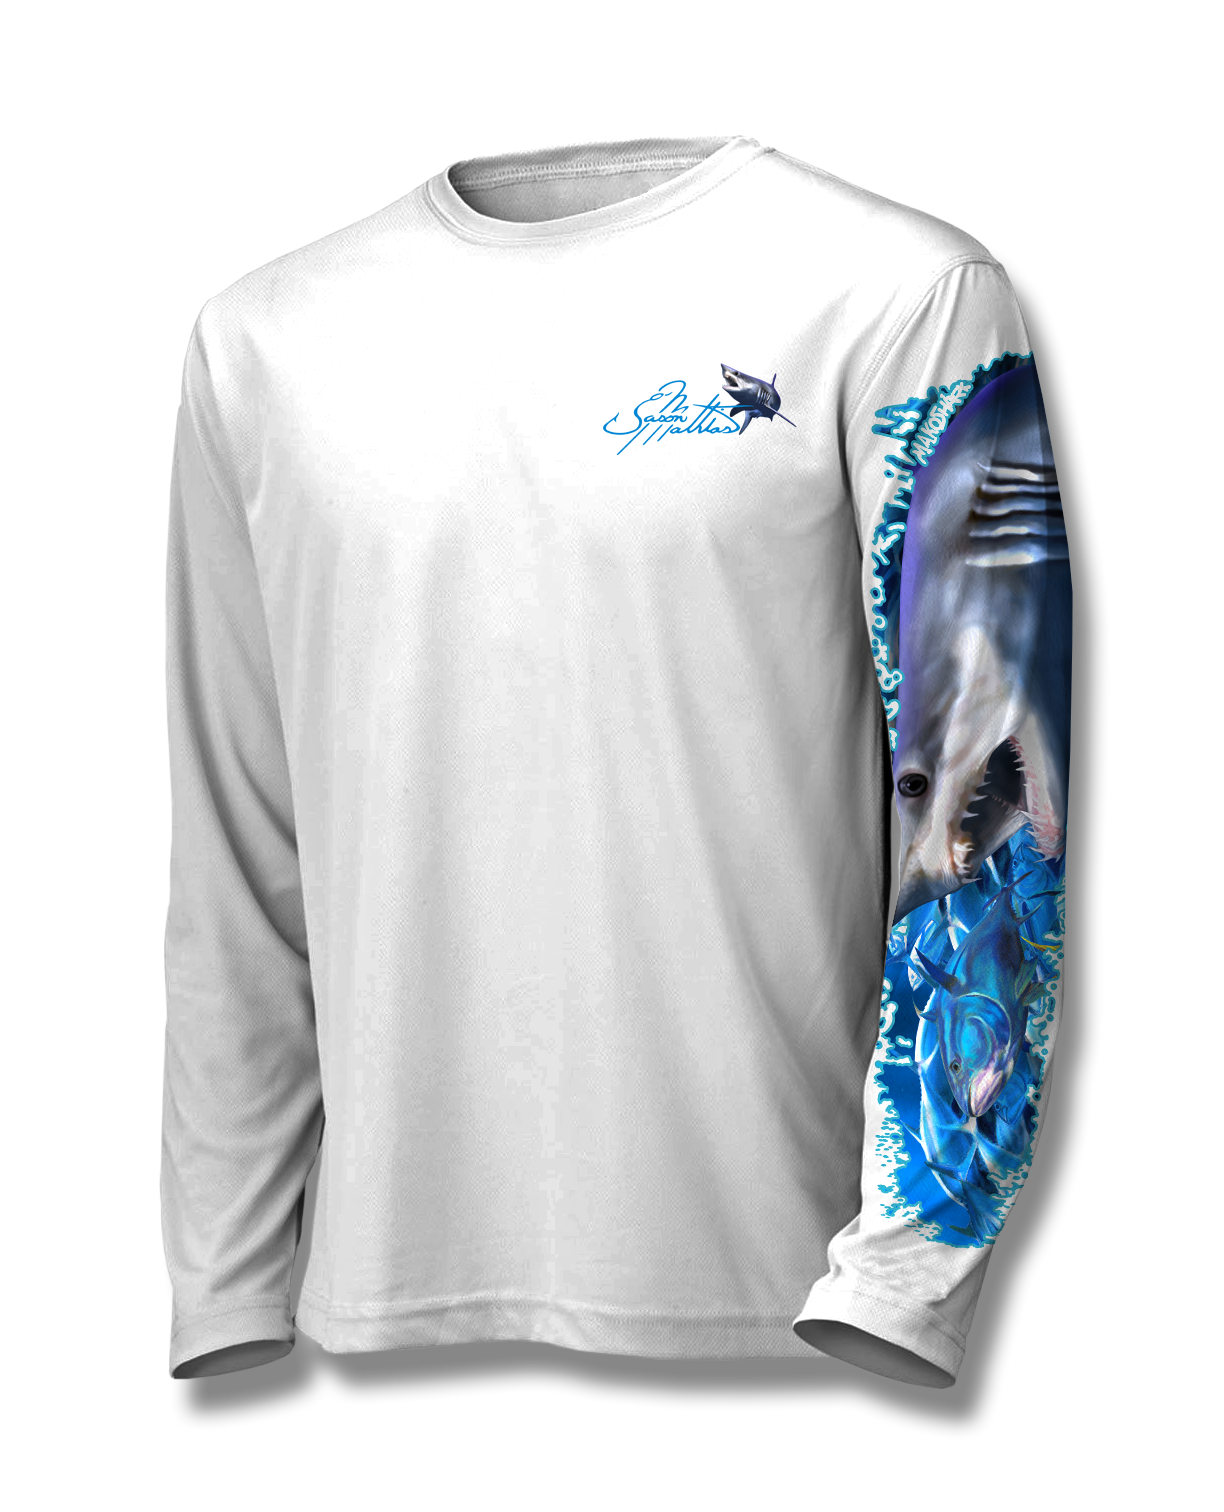 mako-shark-front-white-shirt-jason-mathias.png